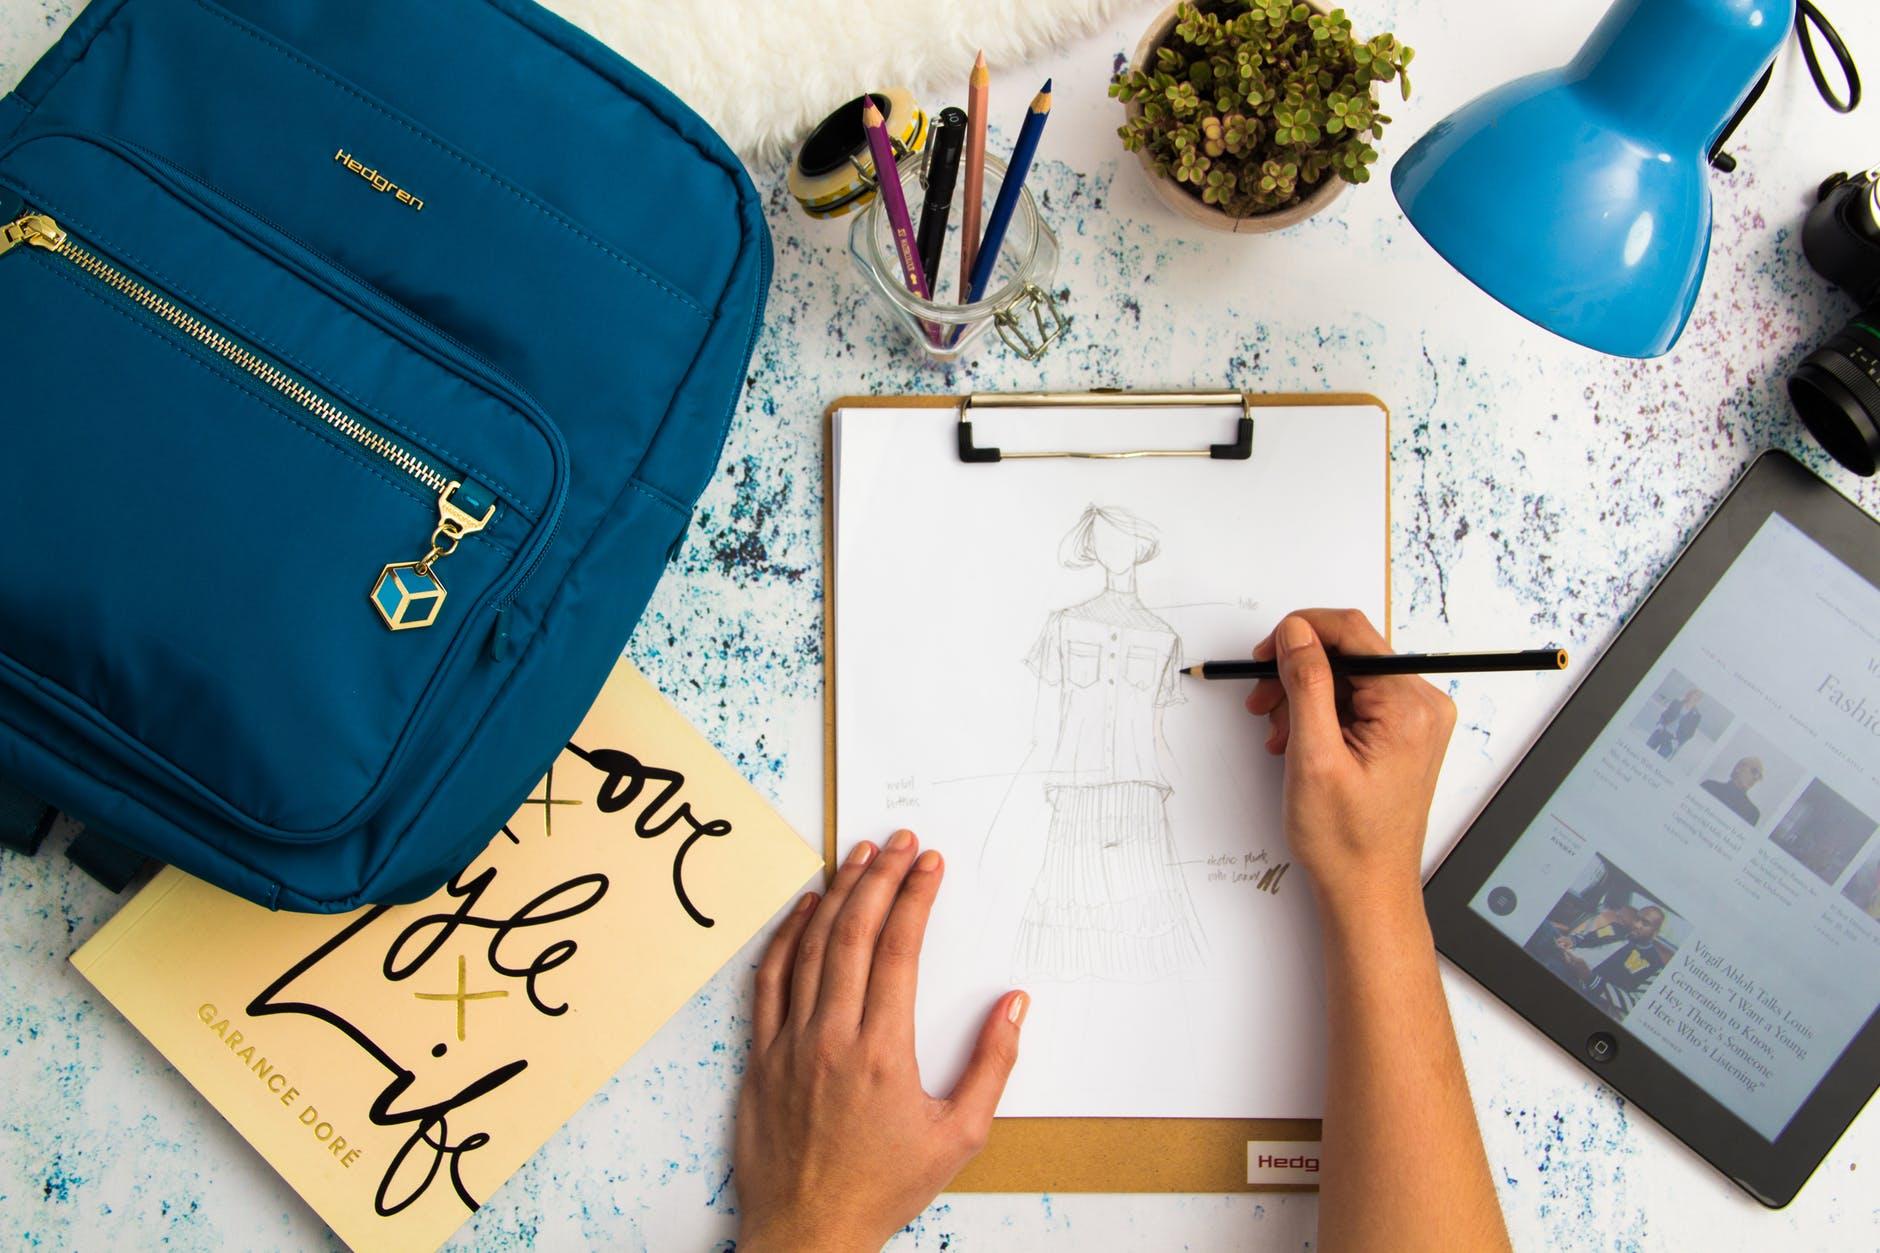 Ingin Jadi Desainer? Yuk, Belajar Desain Baju Otodidak Disini!